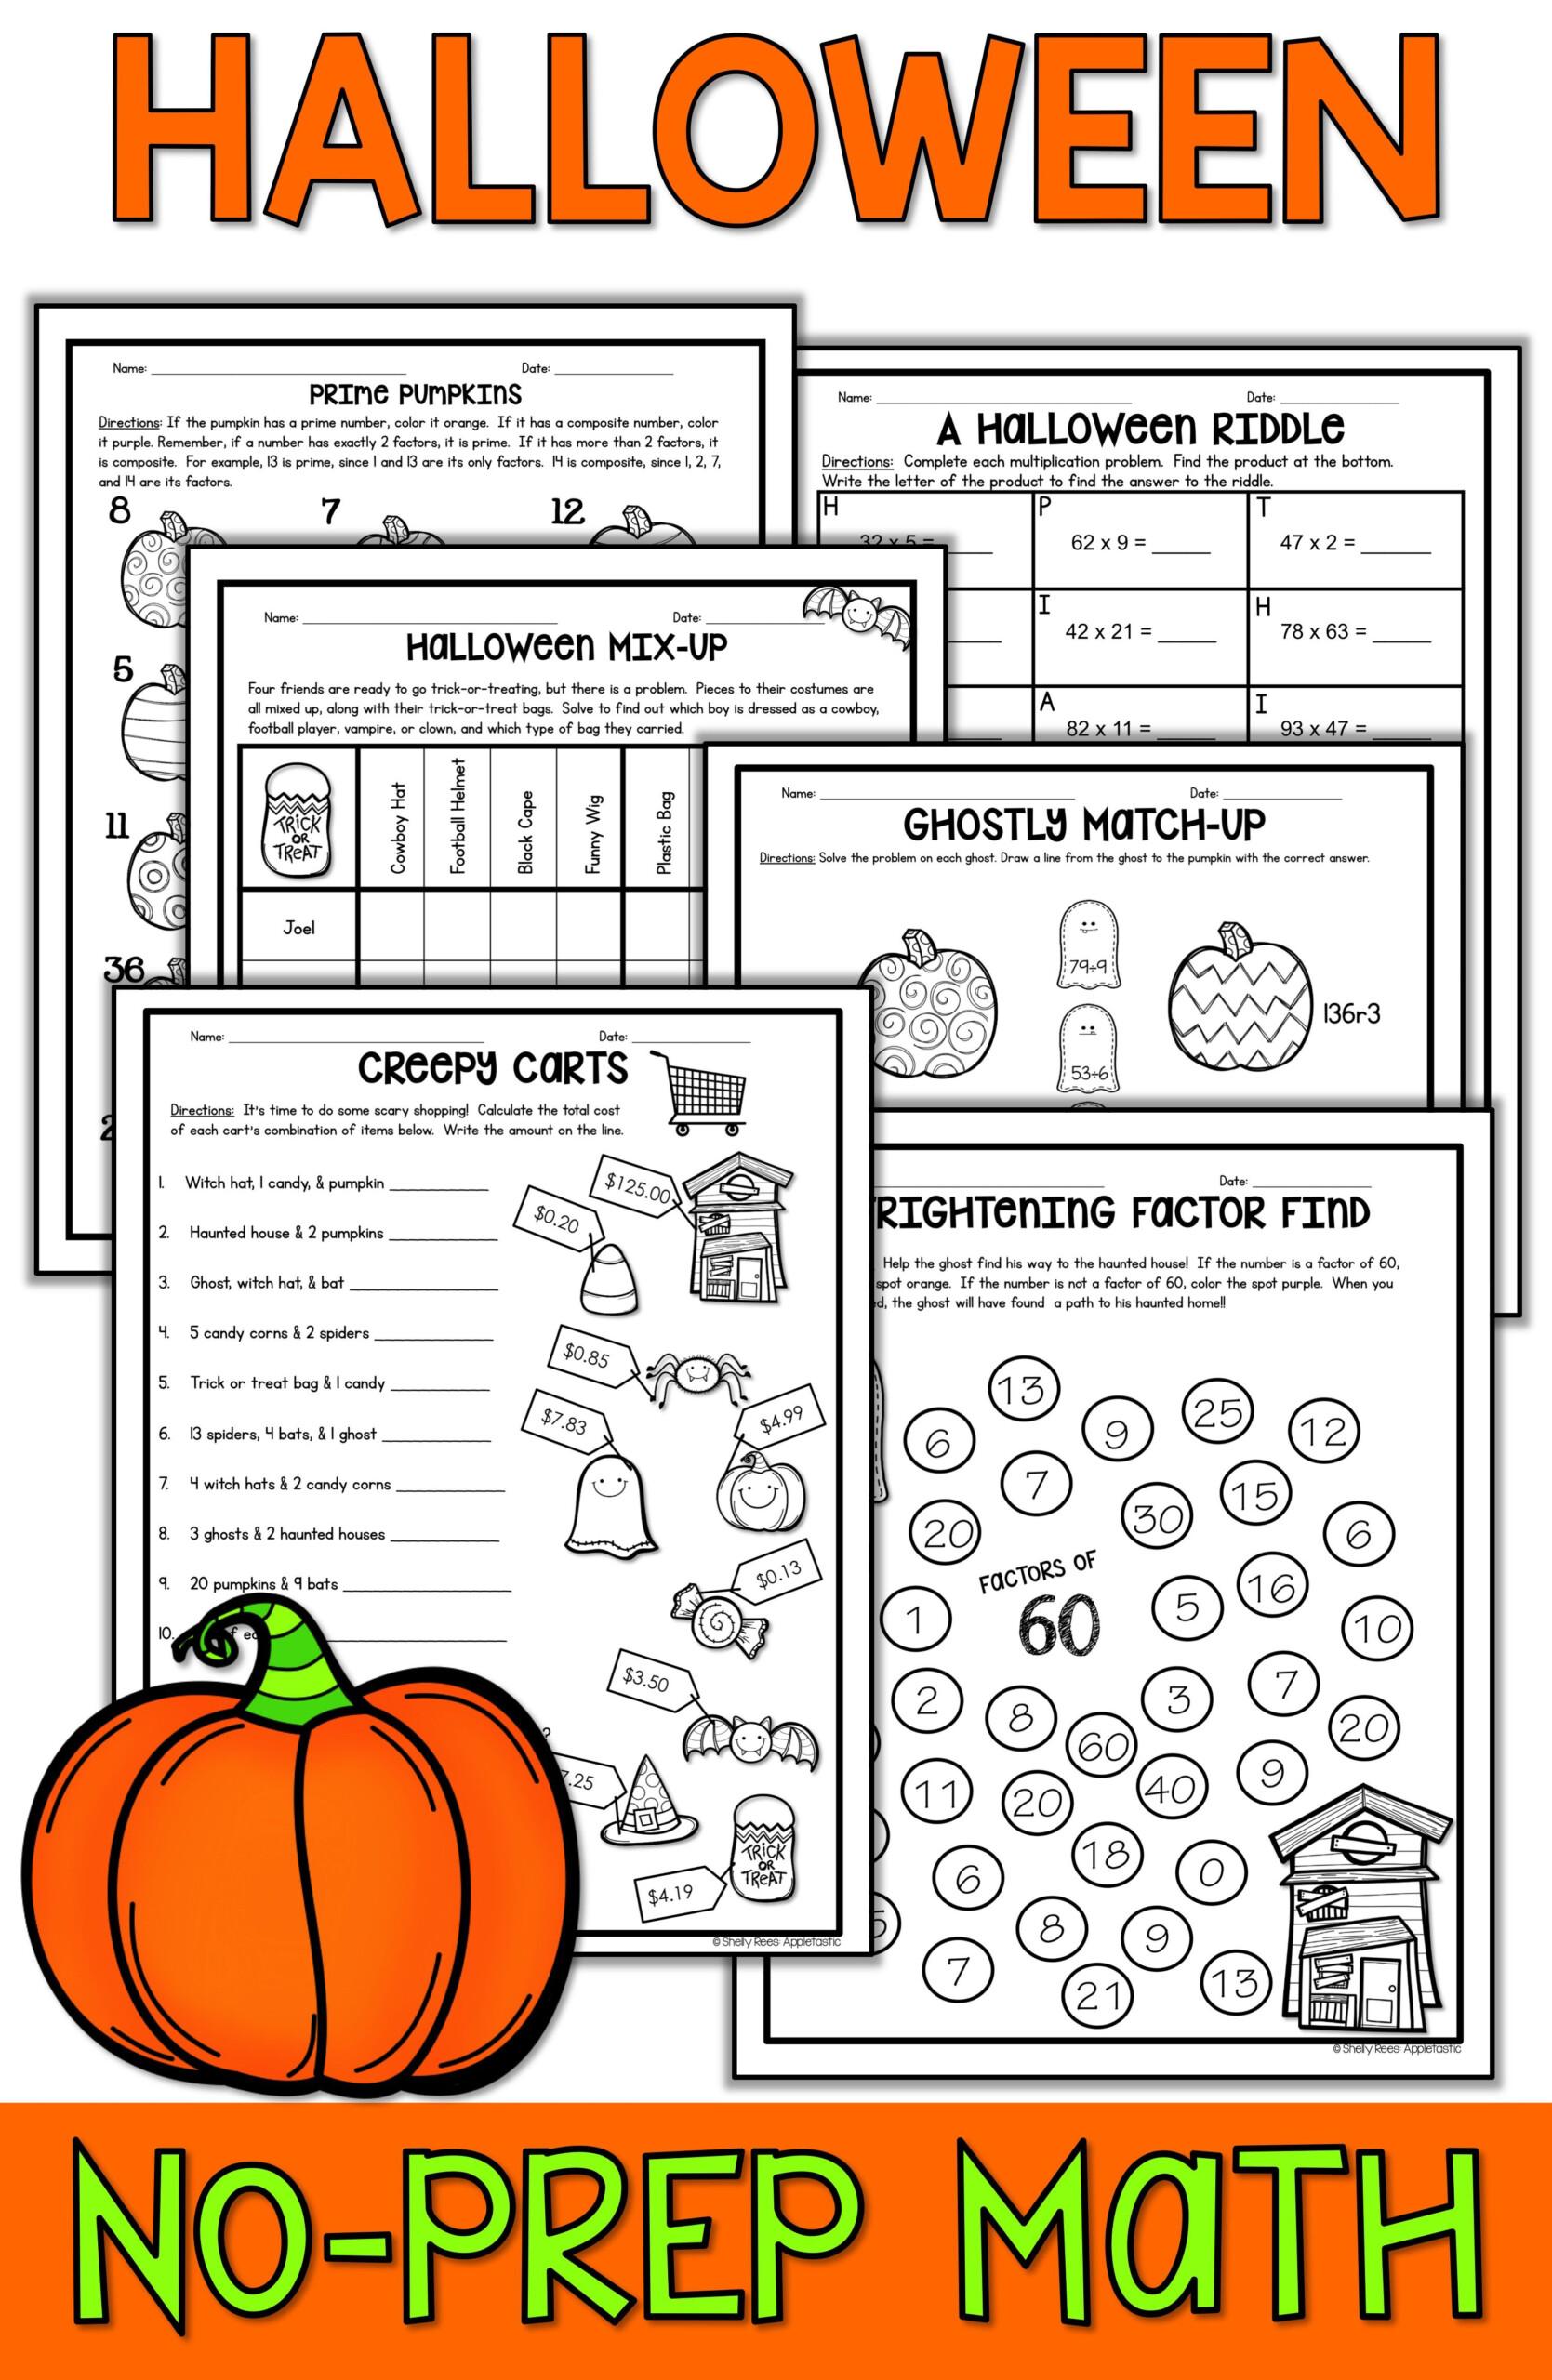 Halloween Math Worksheets | Halloween Math Worksheets intended for Printable Halloween Multiplication Worksheets